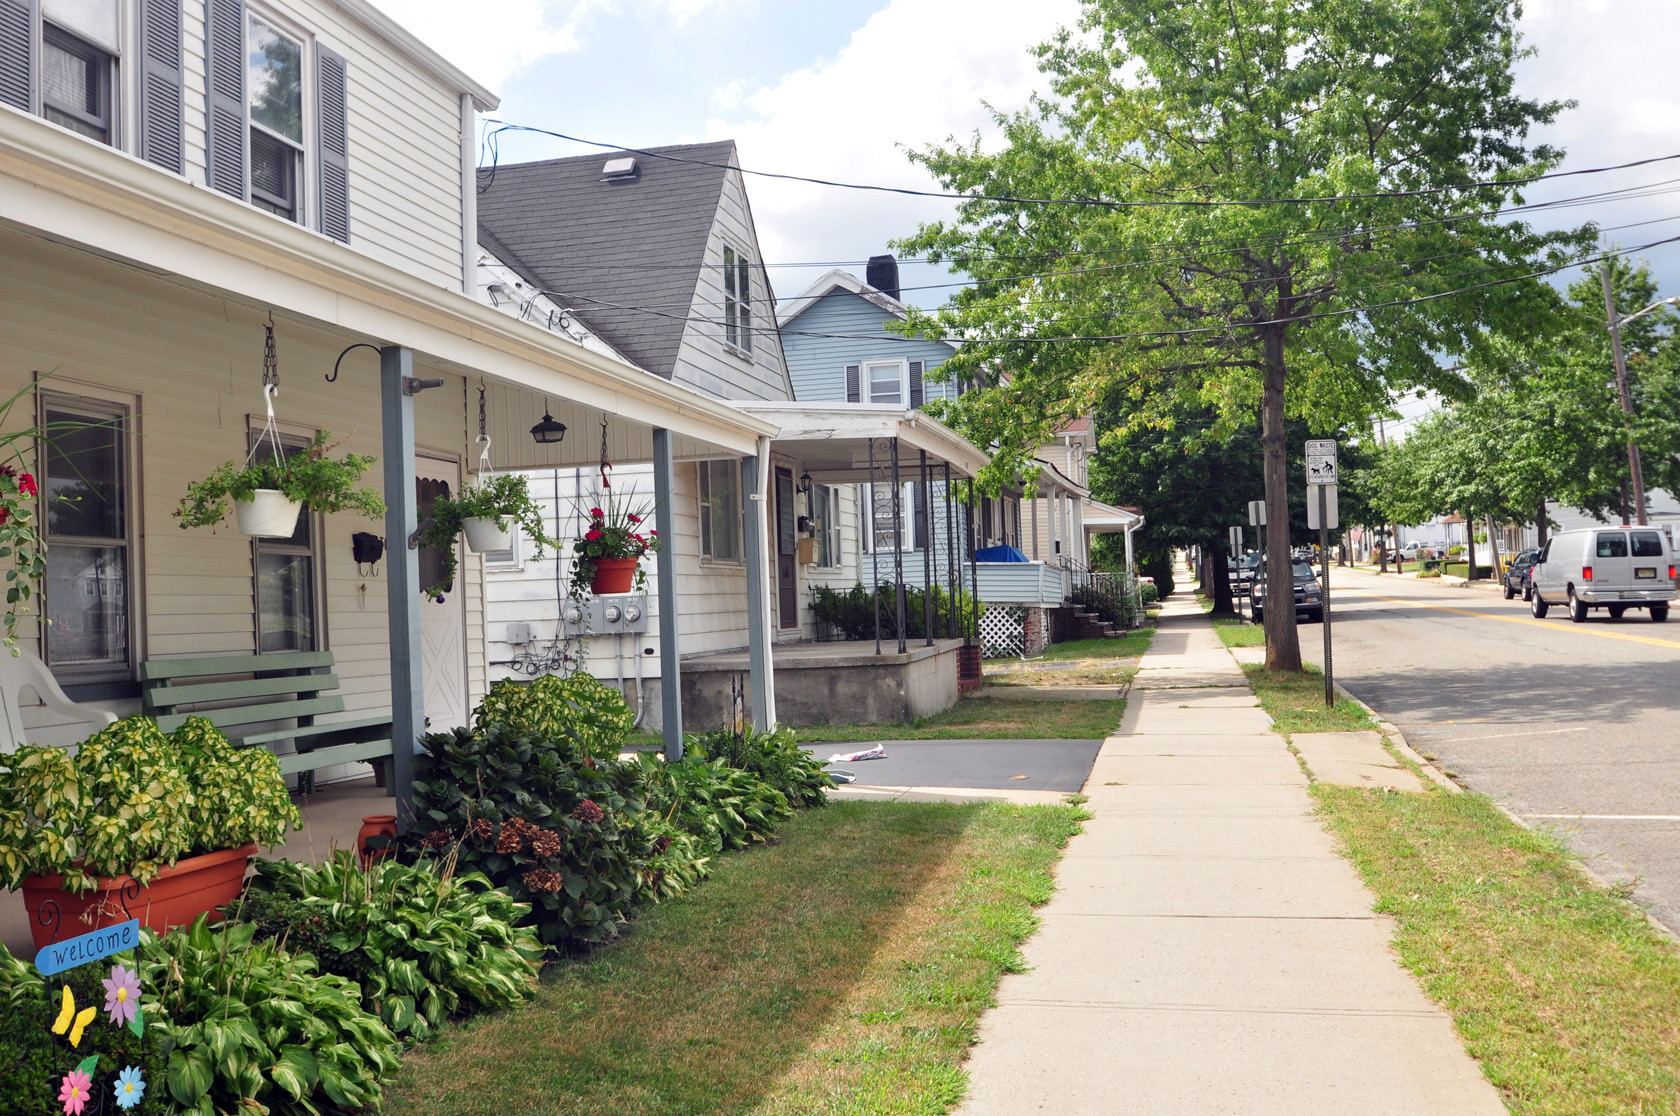 Susan Approved - Neighborhood_Master Plan - COVER PHOTO.JPG